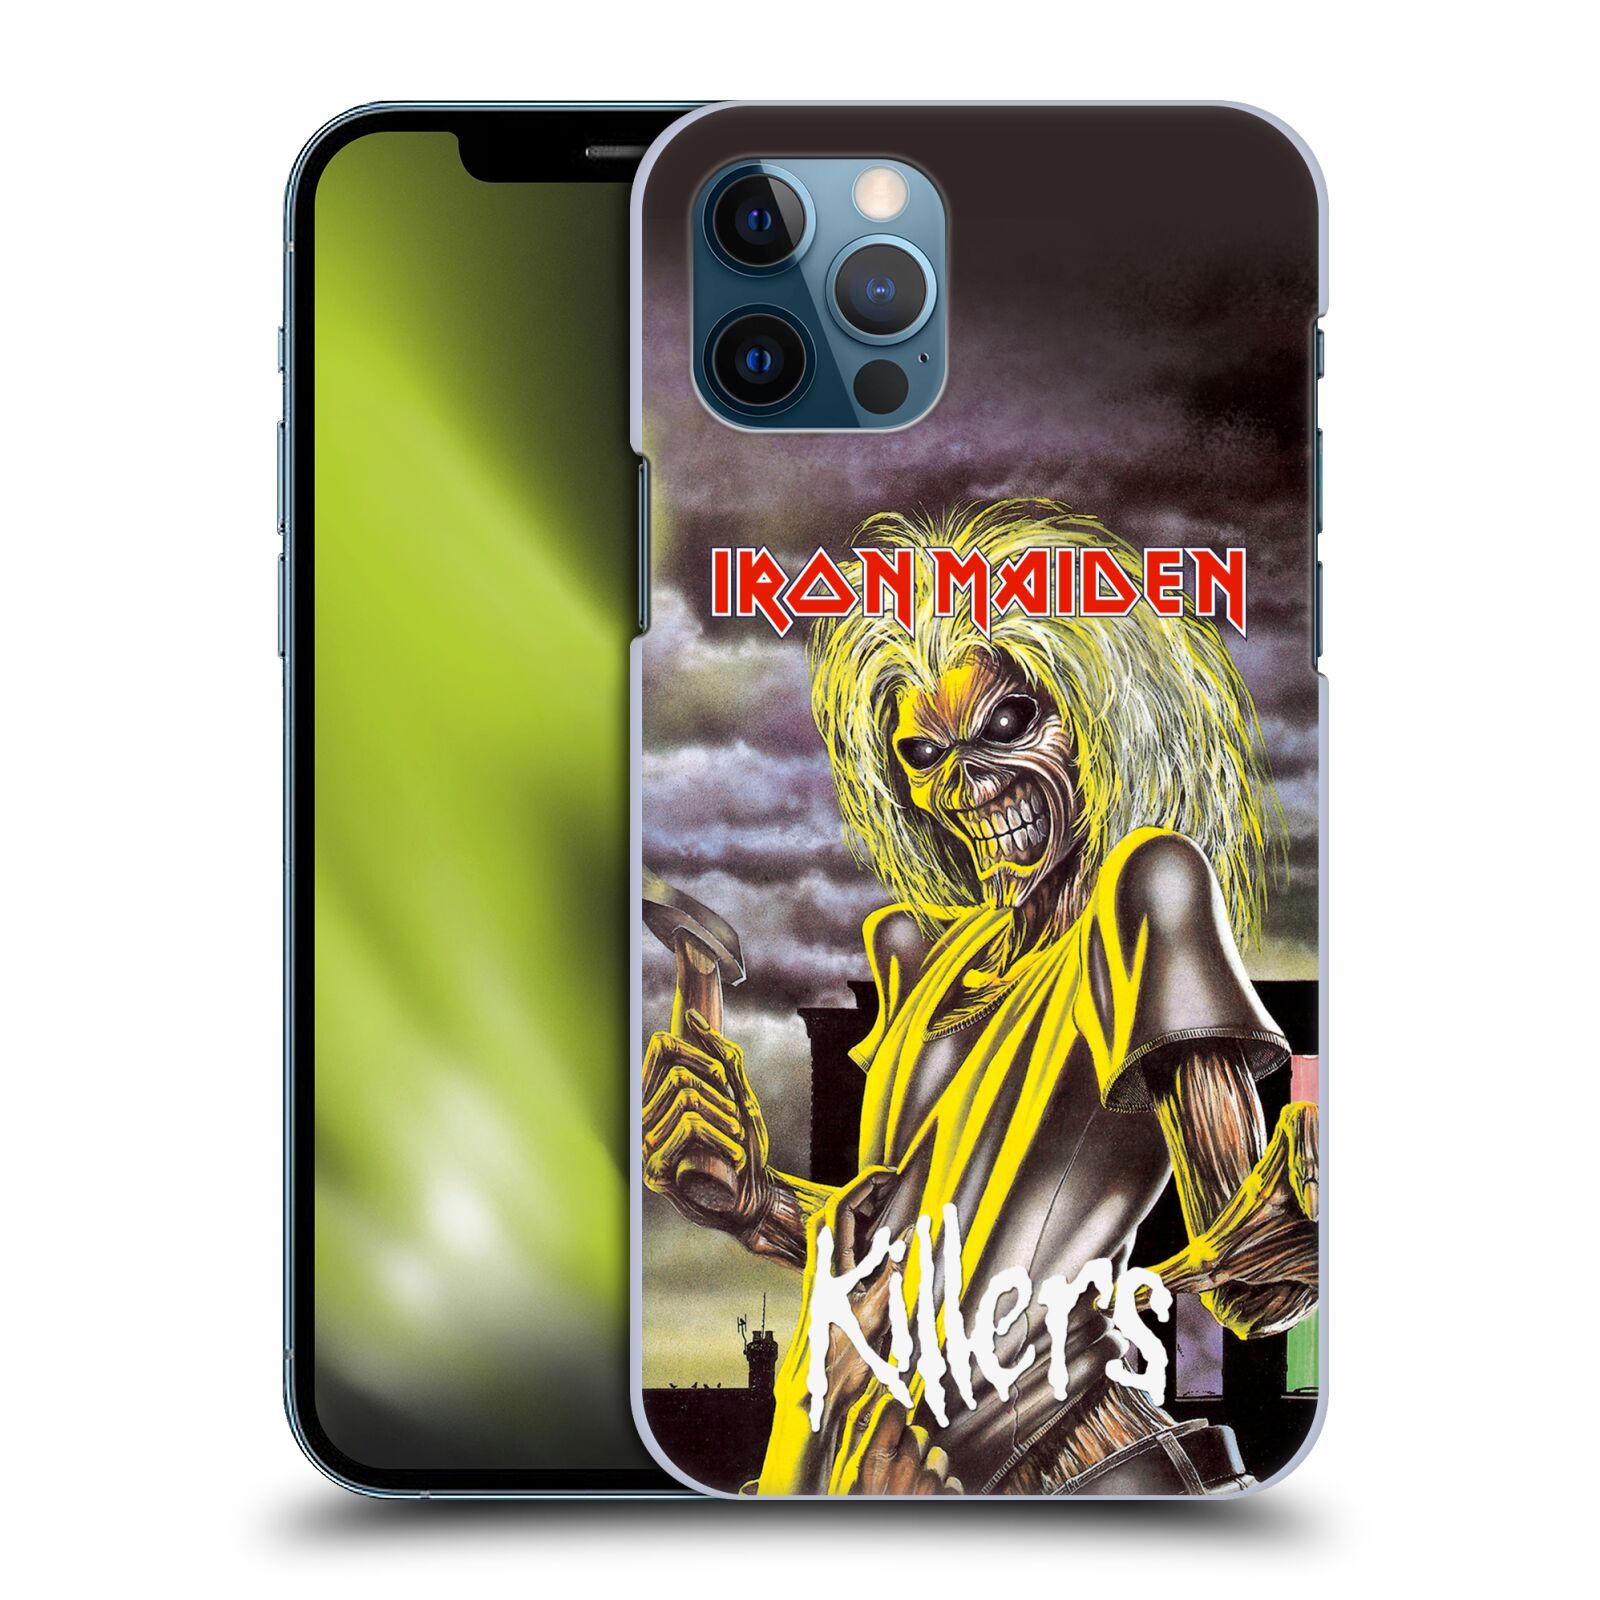 Plastové pouzdro na mobil Apple iPhone 12 / 12 Pro - Head Case - Iron Maiden - Killers